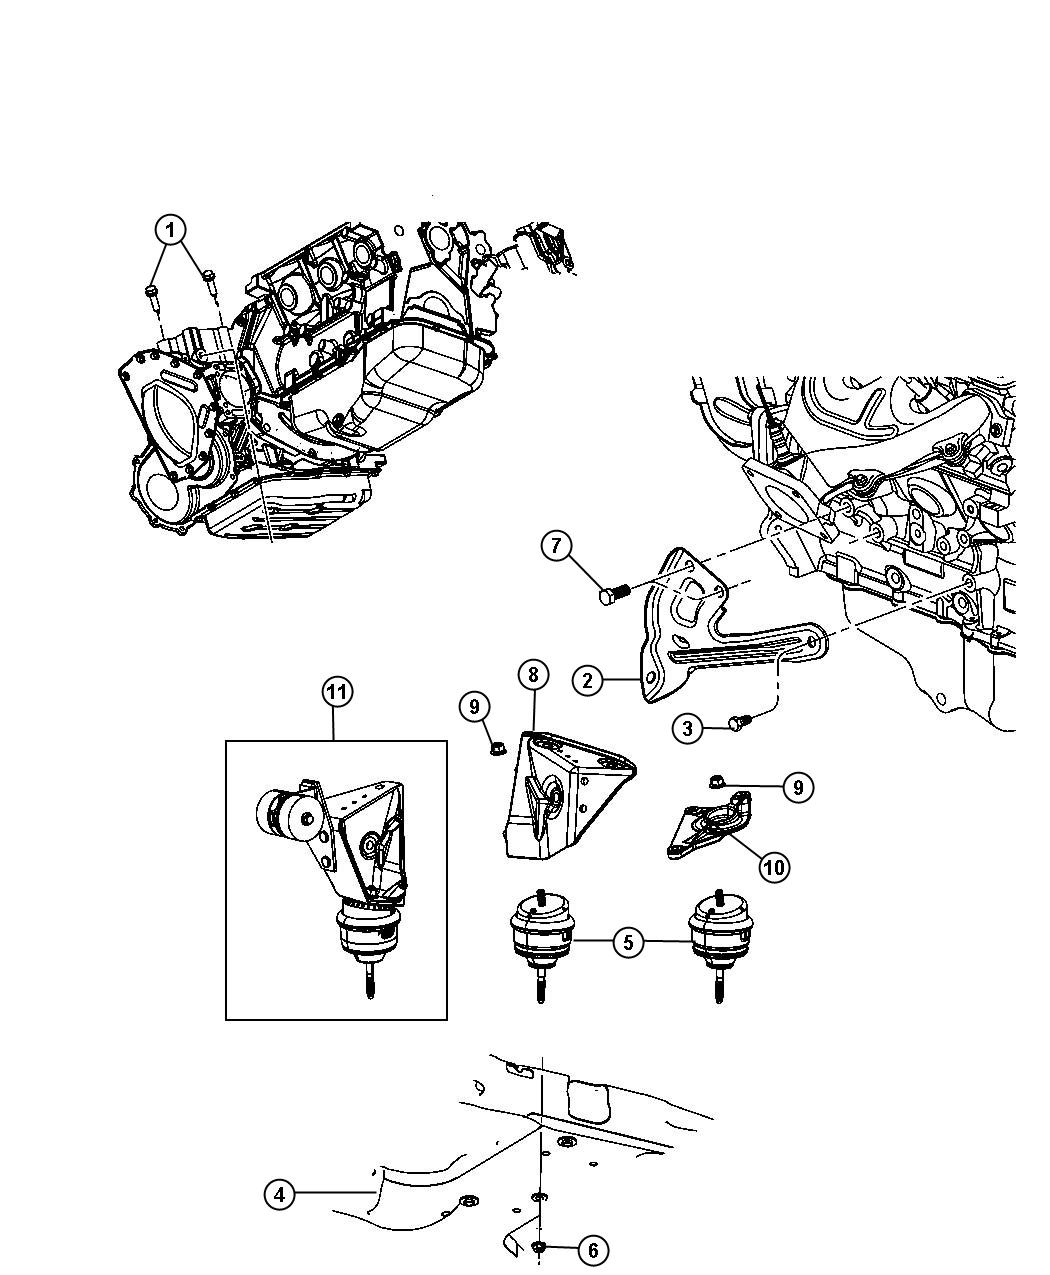 Mount Rear Engine